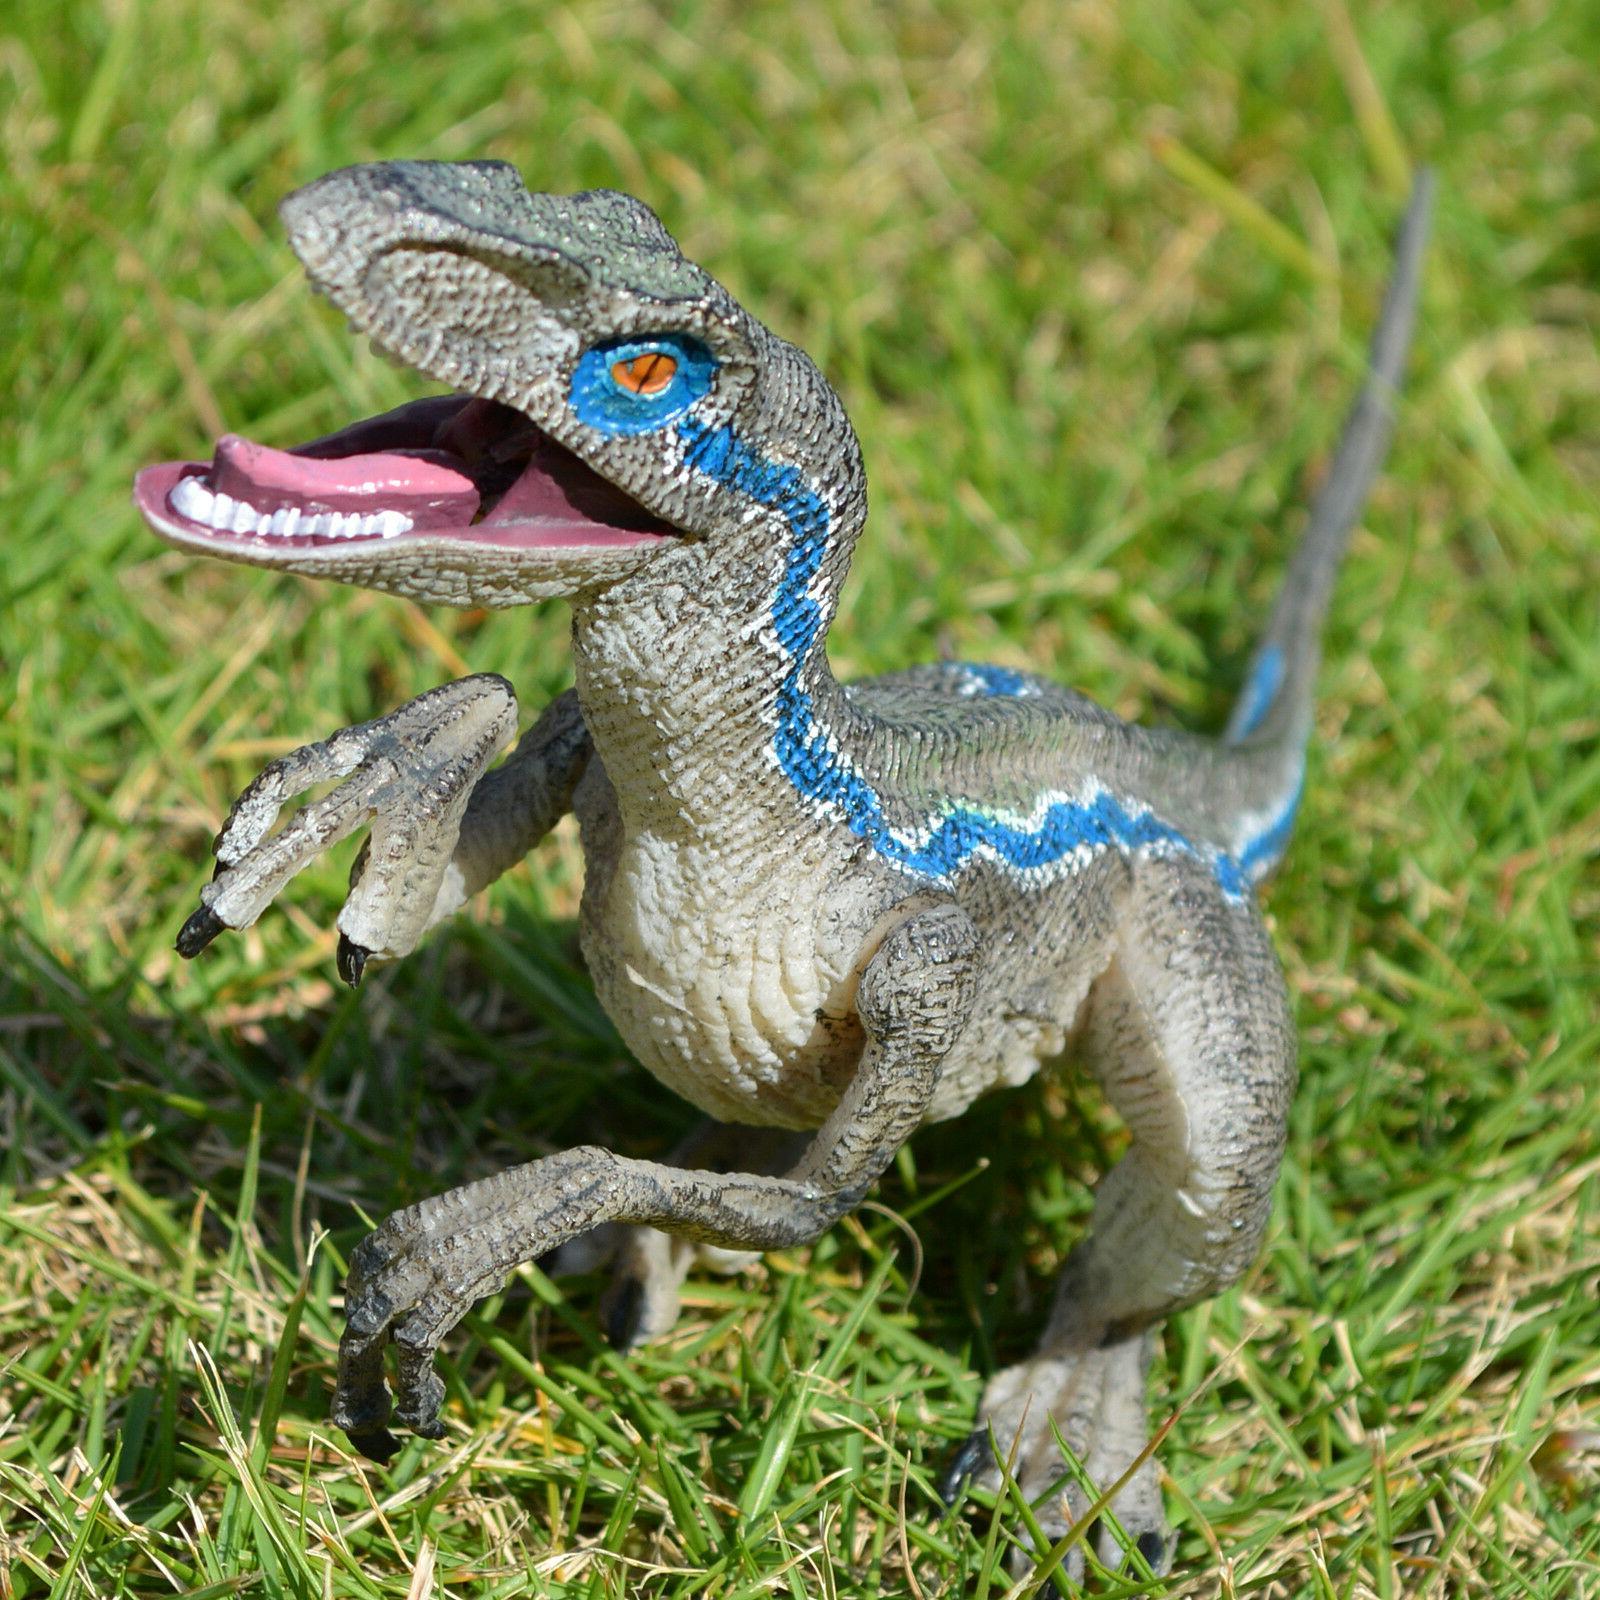 jurassic blue raptor dinosaur velociraptor toy educational